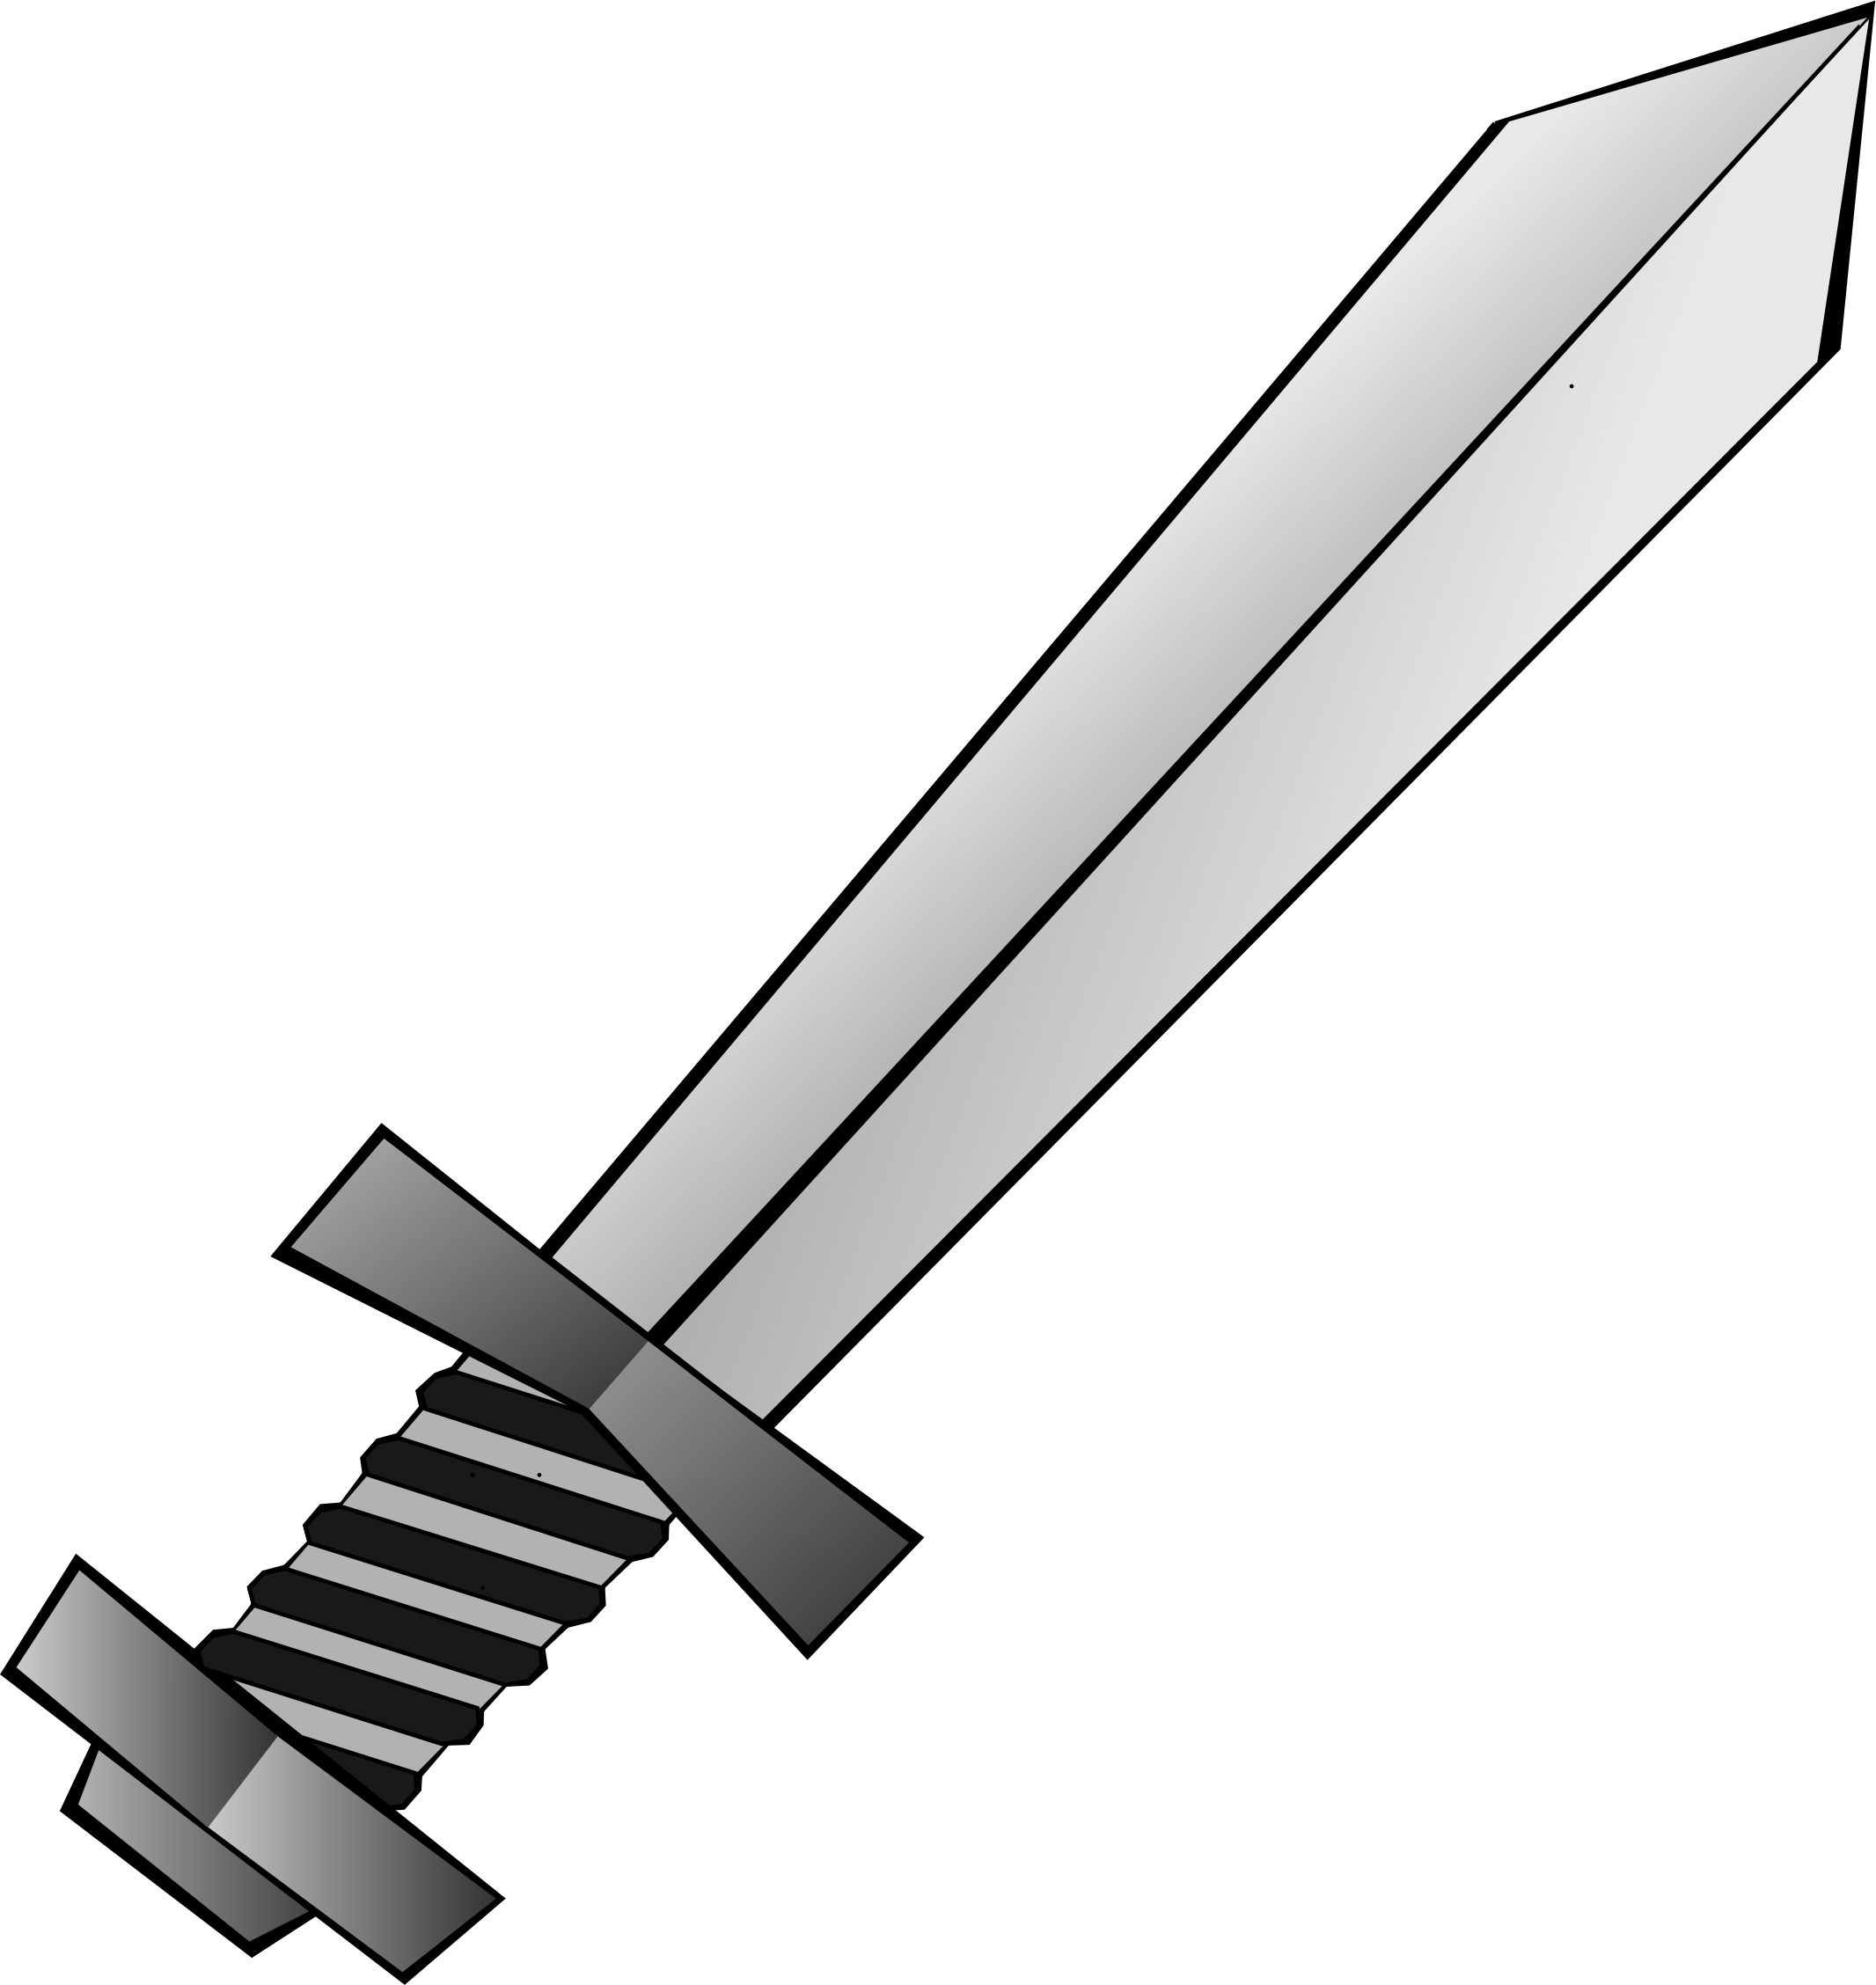 Clip art sword - ClipartFest-Clip art sword - ClipartFest-6